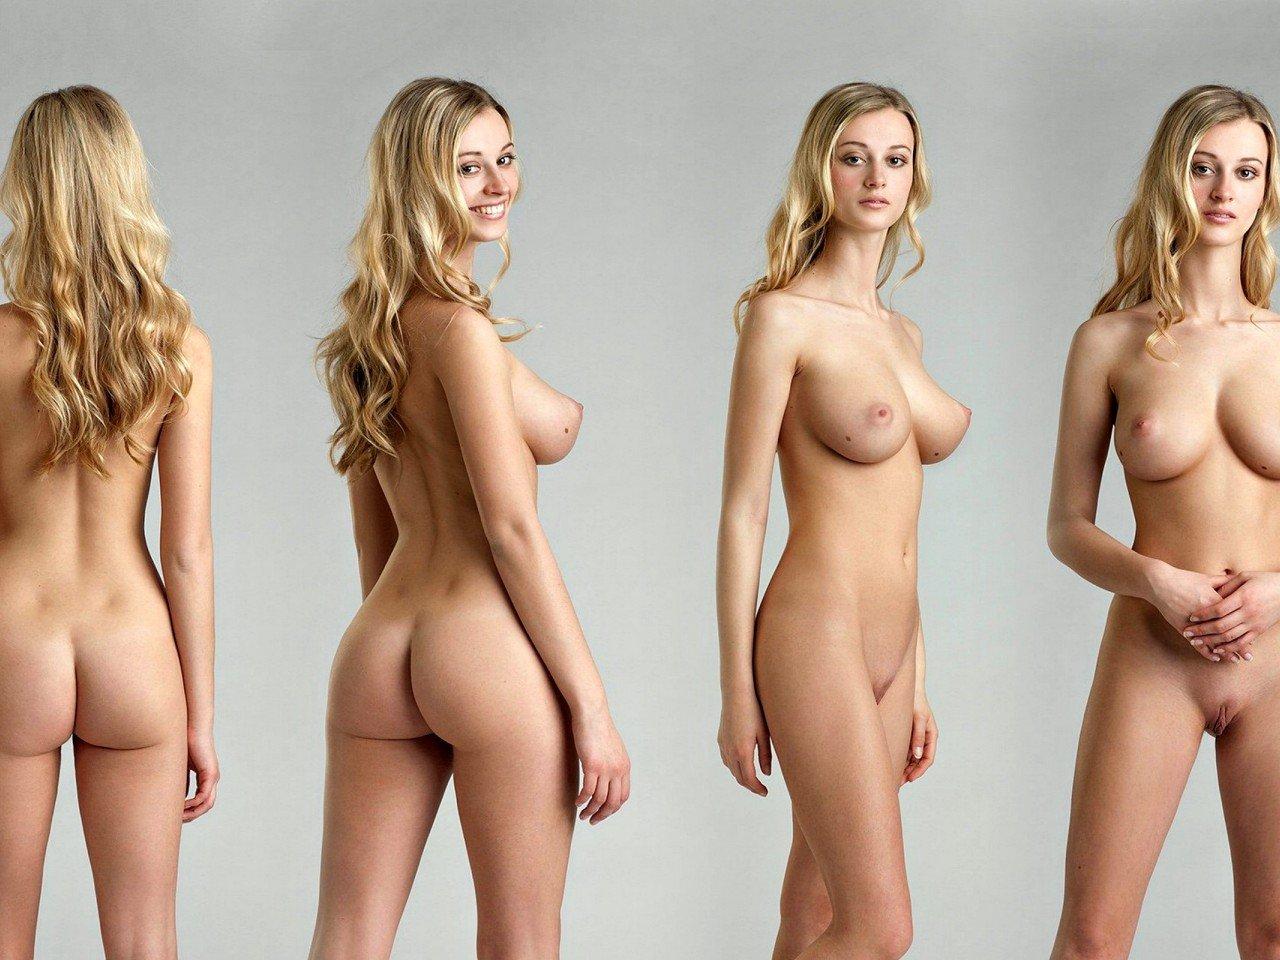 Indian Girl Nude Pics Full Set